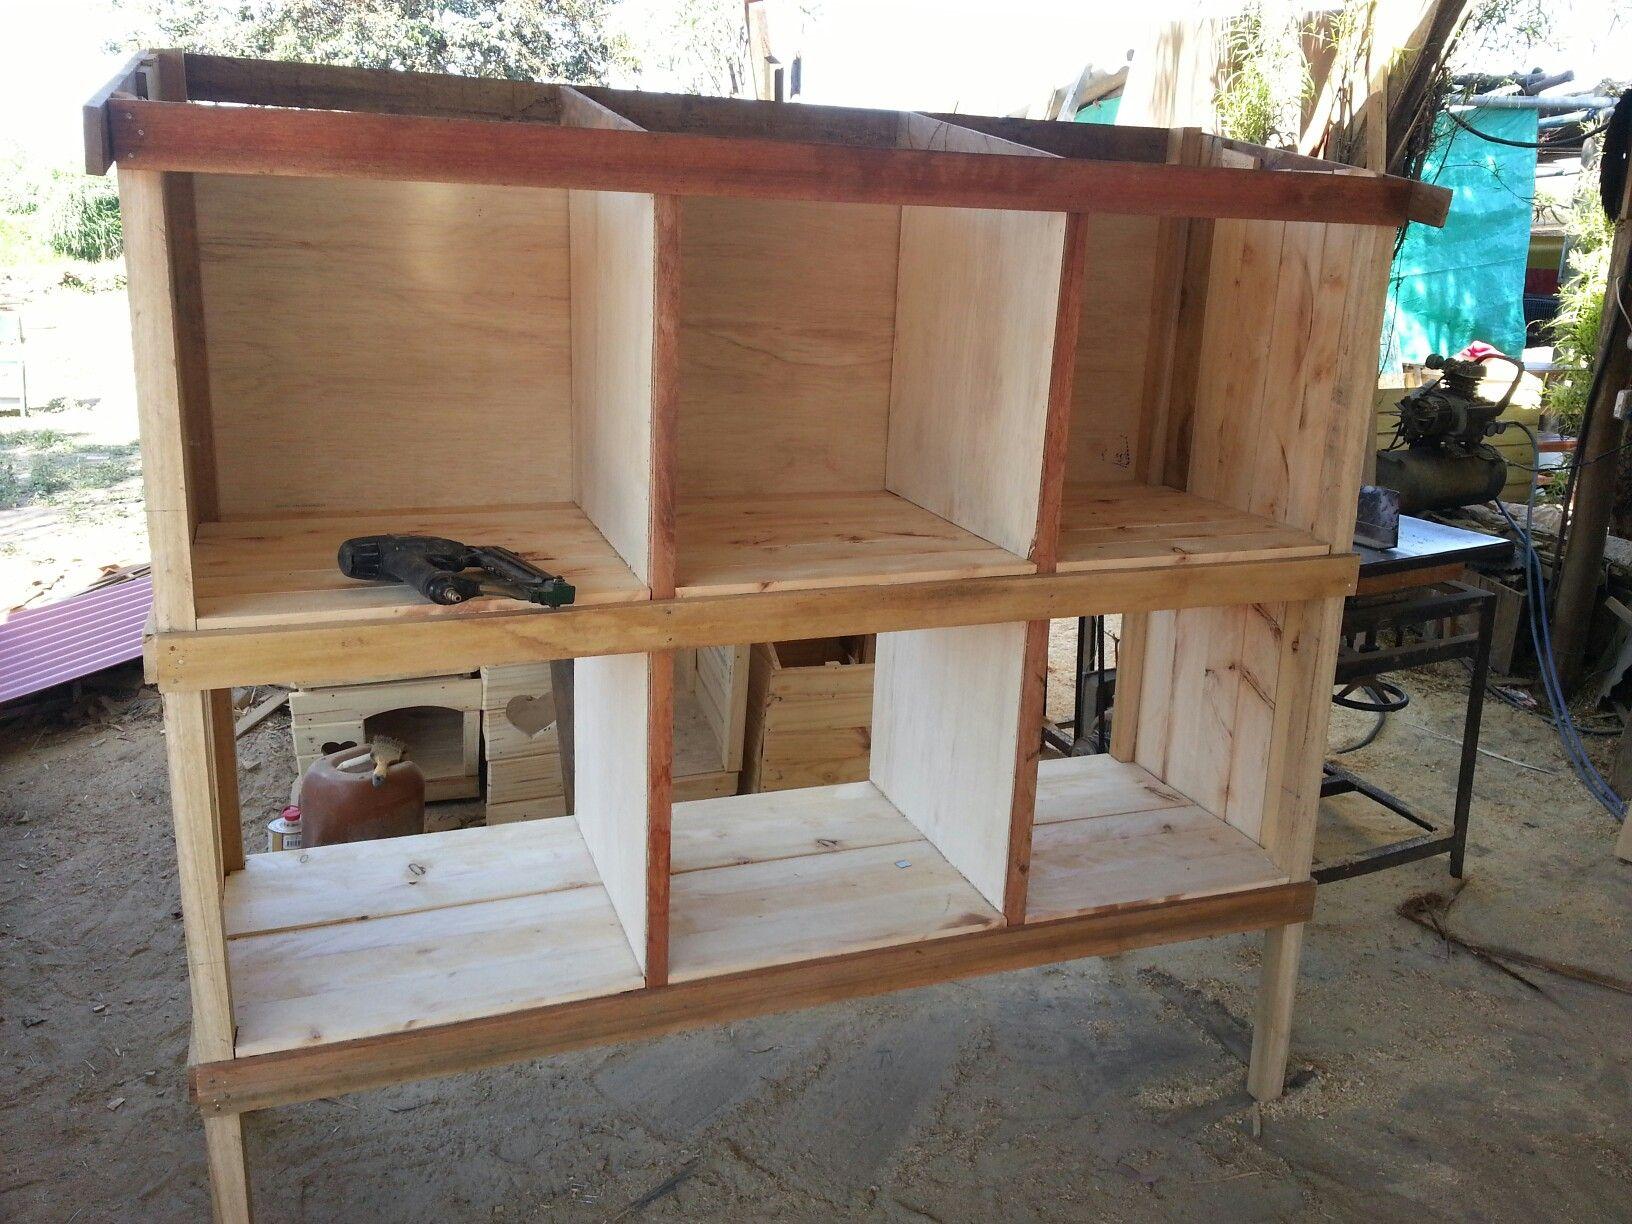 Construcci n jaula de gallos de pelea jaula de for Construccion de jaulas flotantes para tilapia